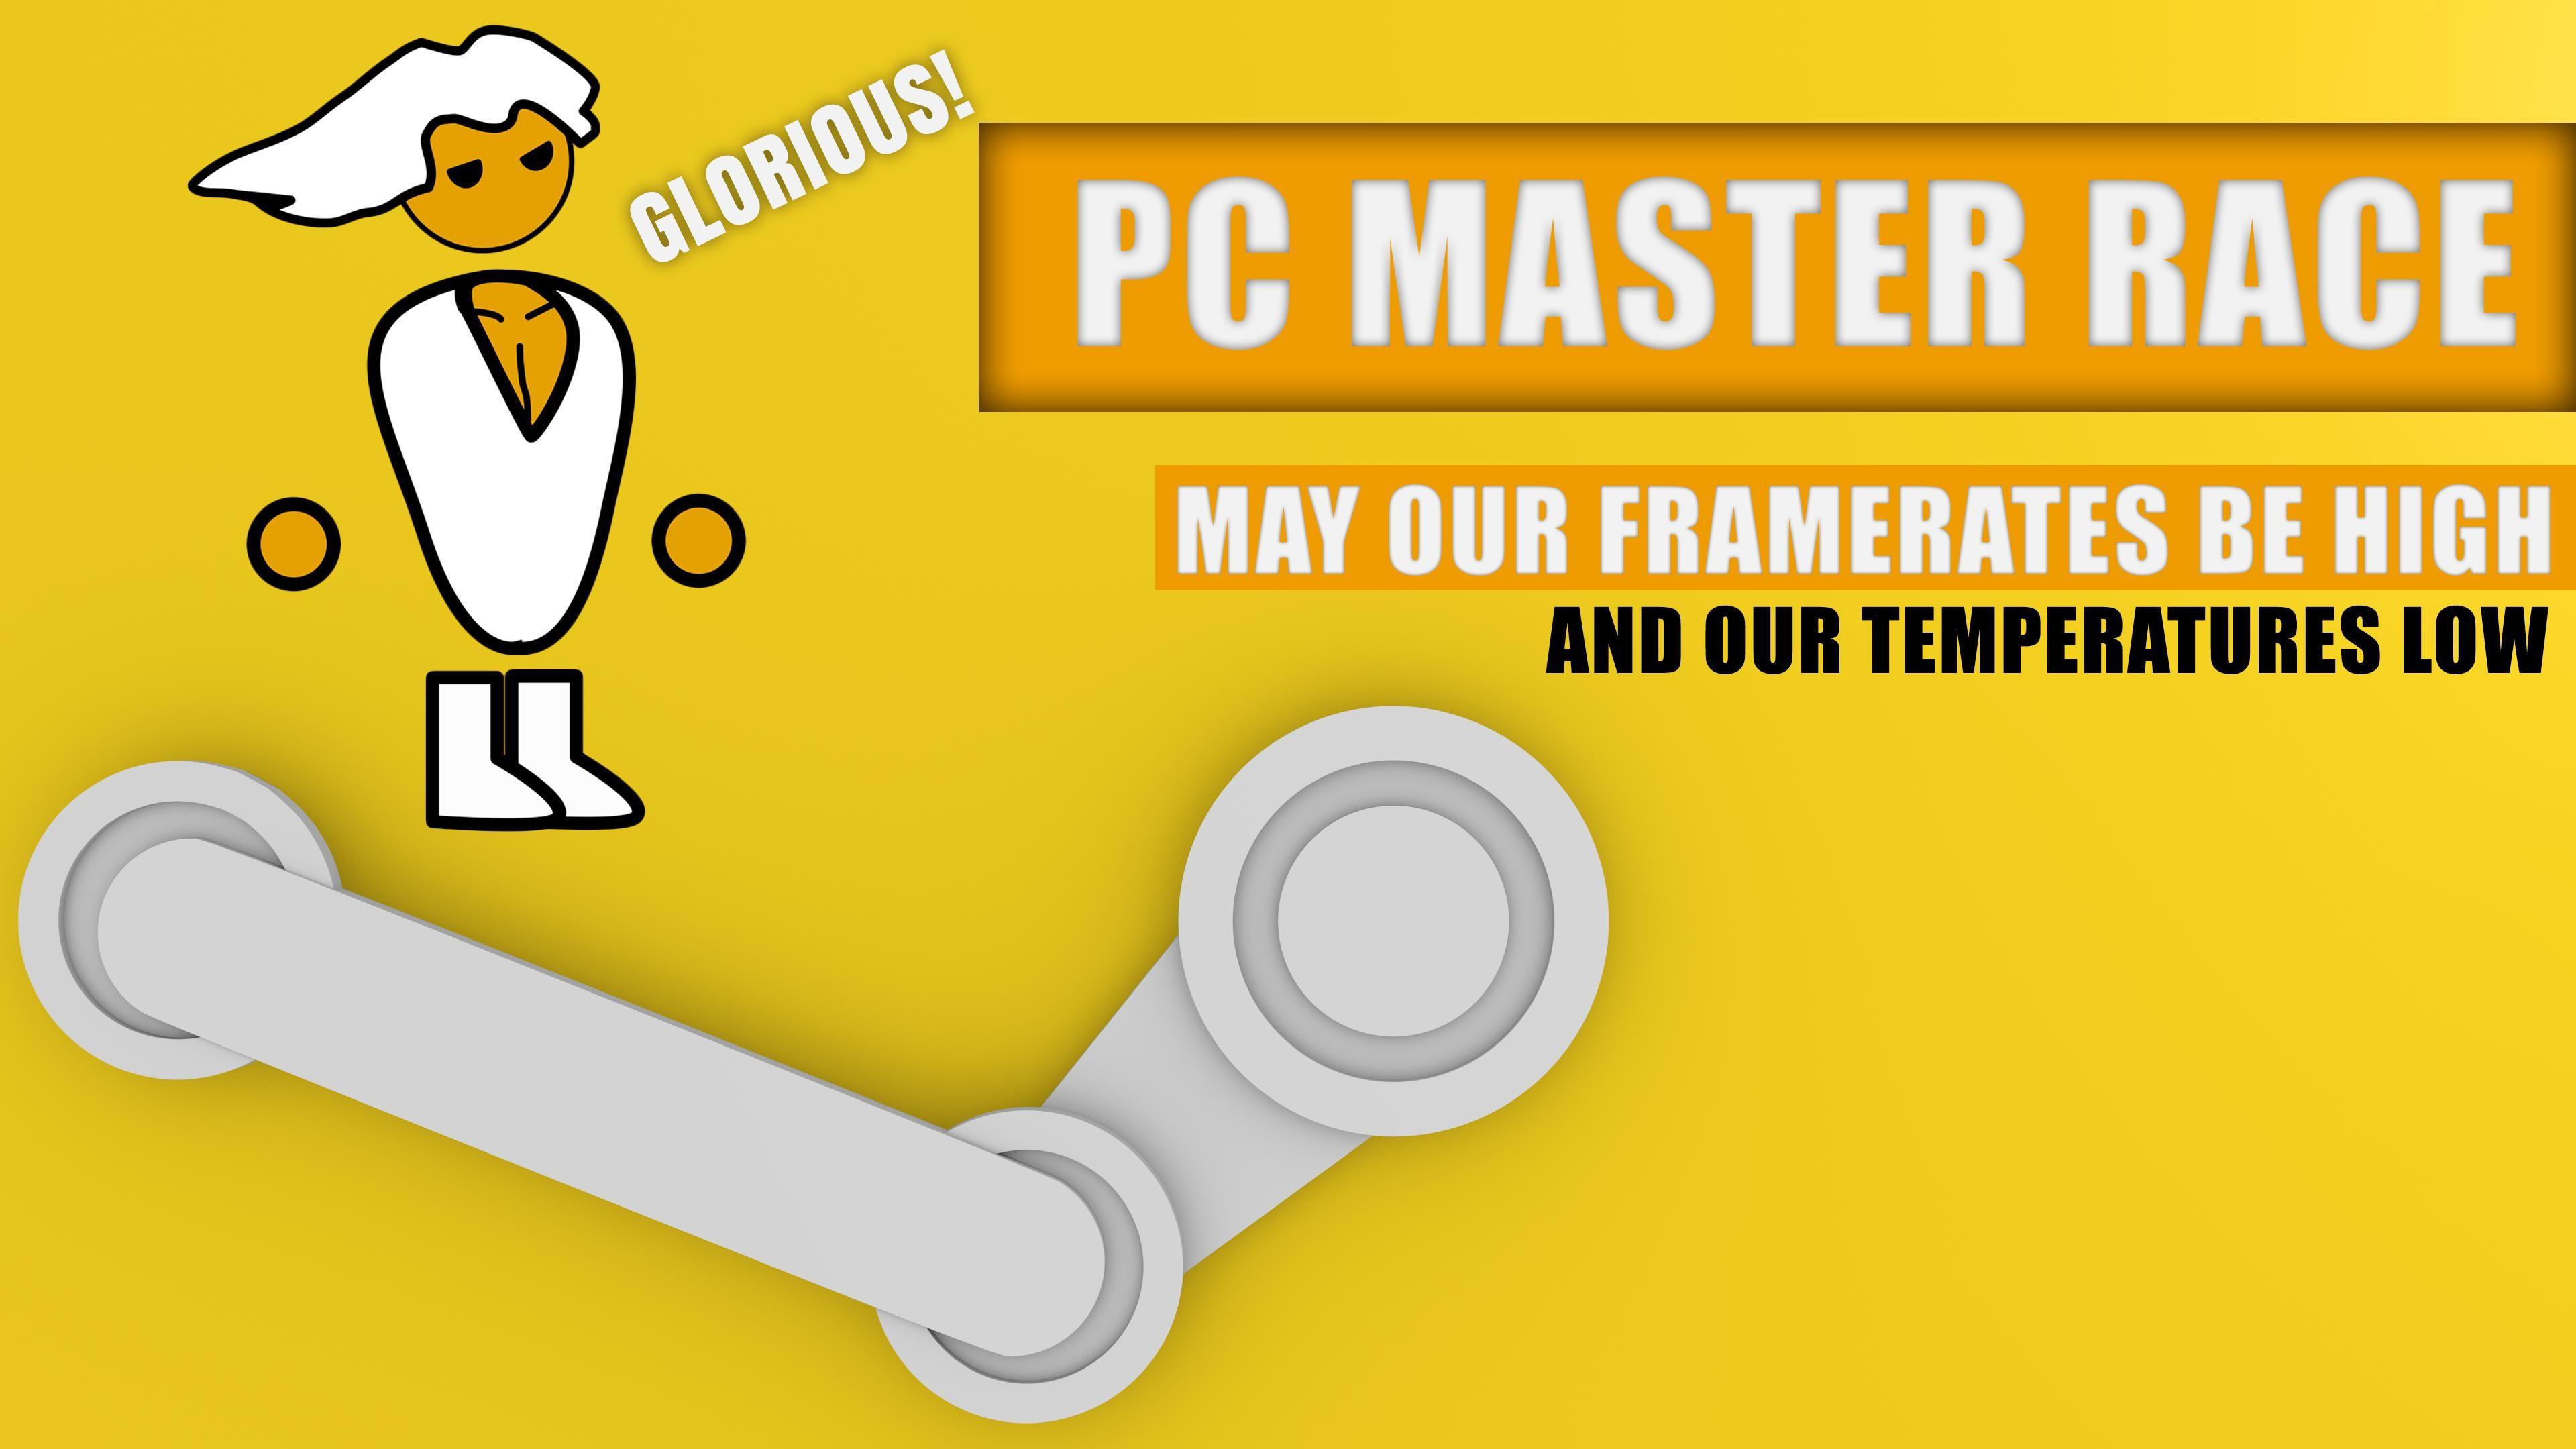 Glorious PC Master Race Wallpaper 4K